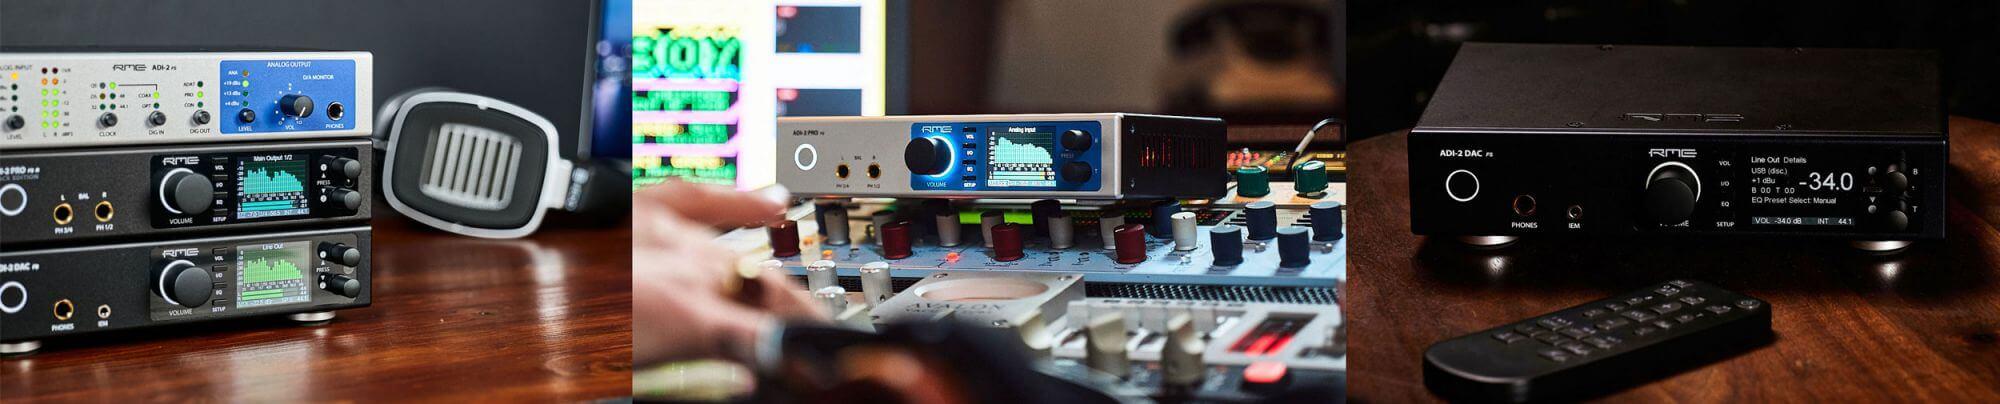 RME ADI-2 Series - Strip - Synthax Audio UK